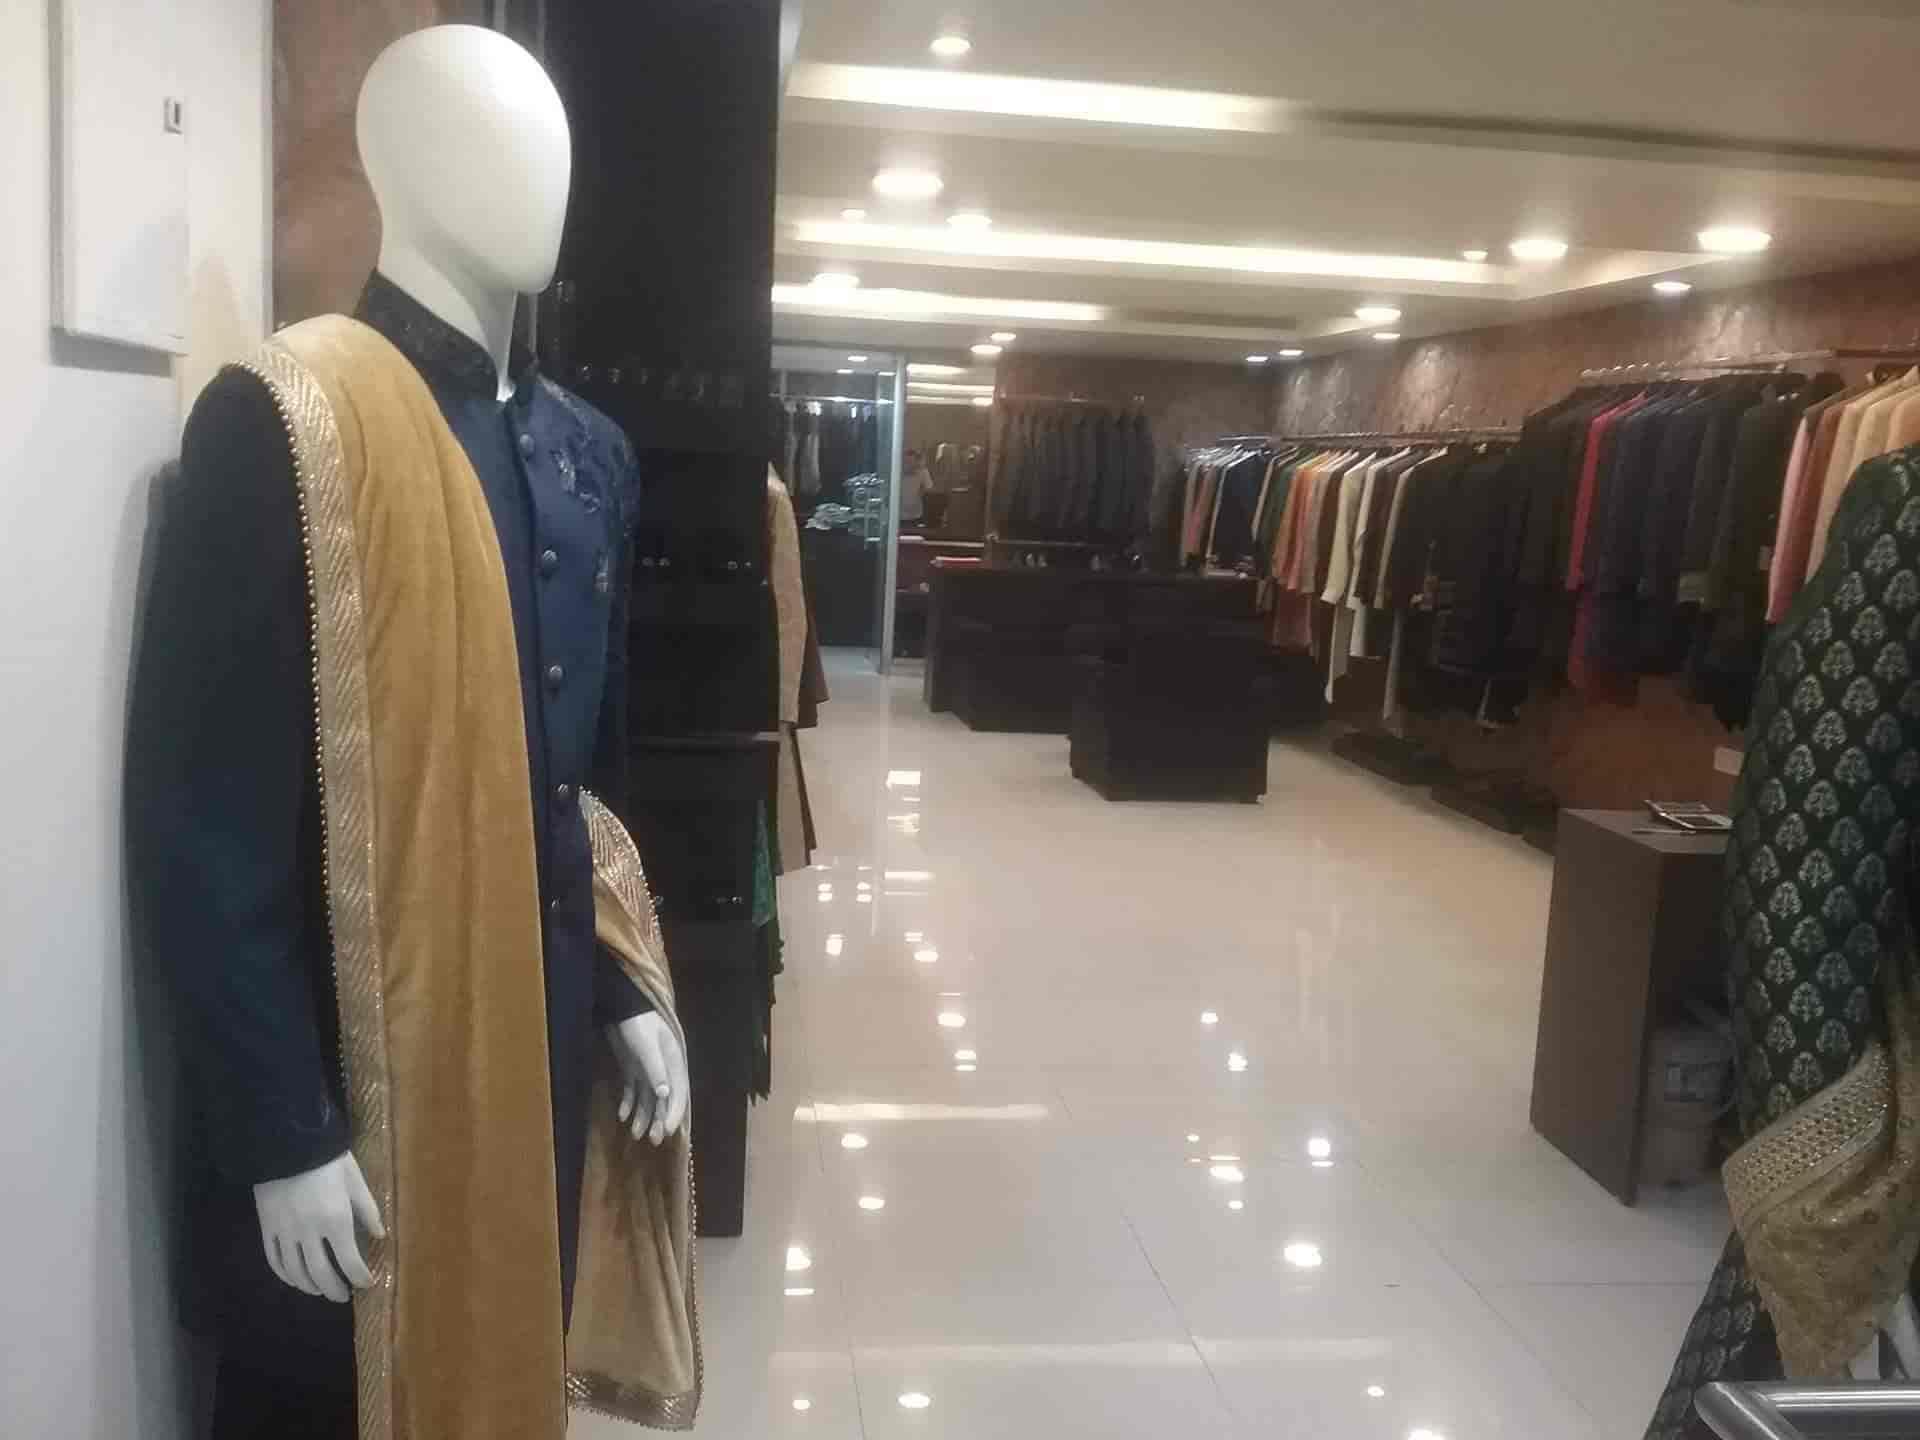 eaff0bababe2b Ashish Mukherjee, Lajpat Nagar 2 - Mens Wear Retailers in Delhi - Justdial